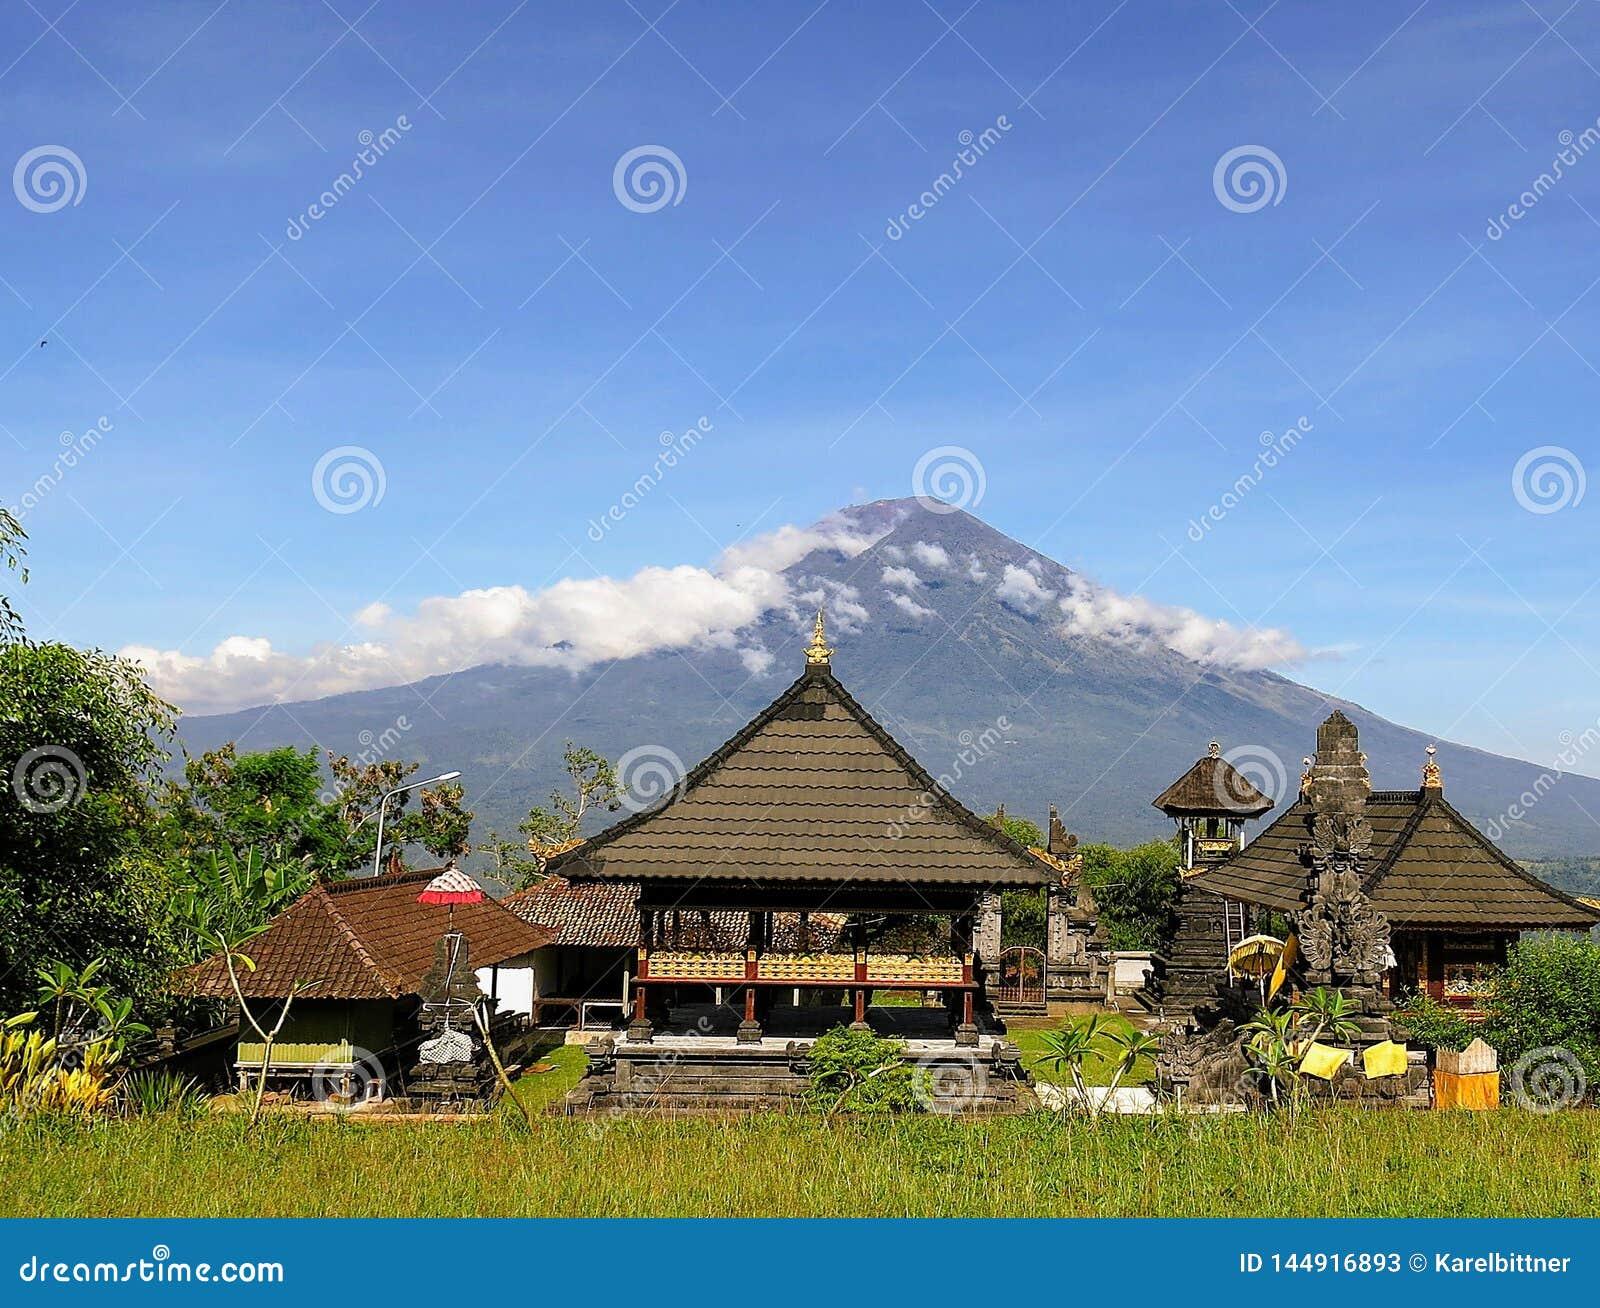 View Of Volcano Gunung Agung On Bali Island In Indonesia Stock